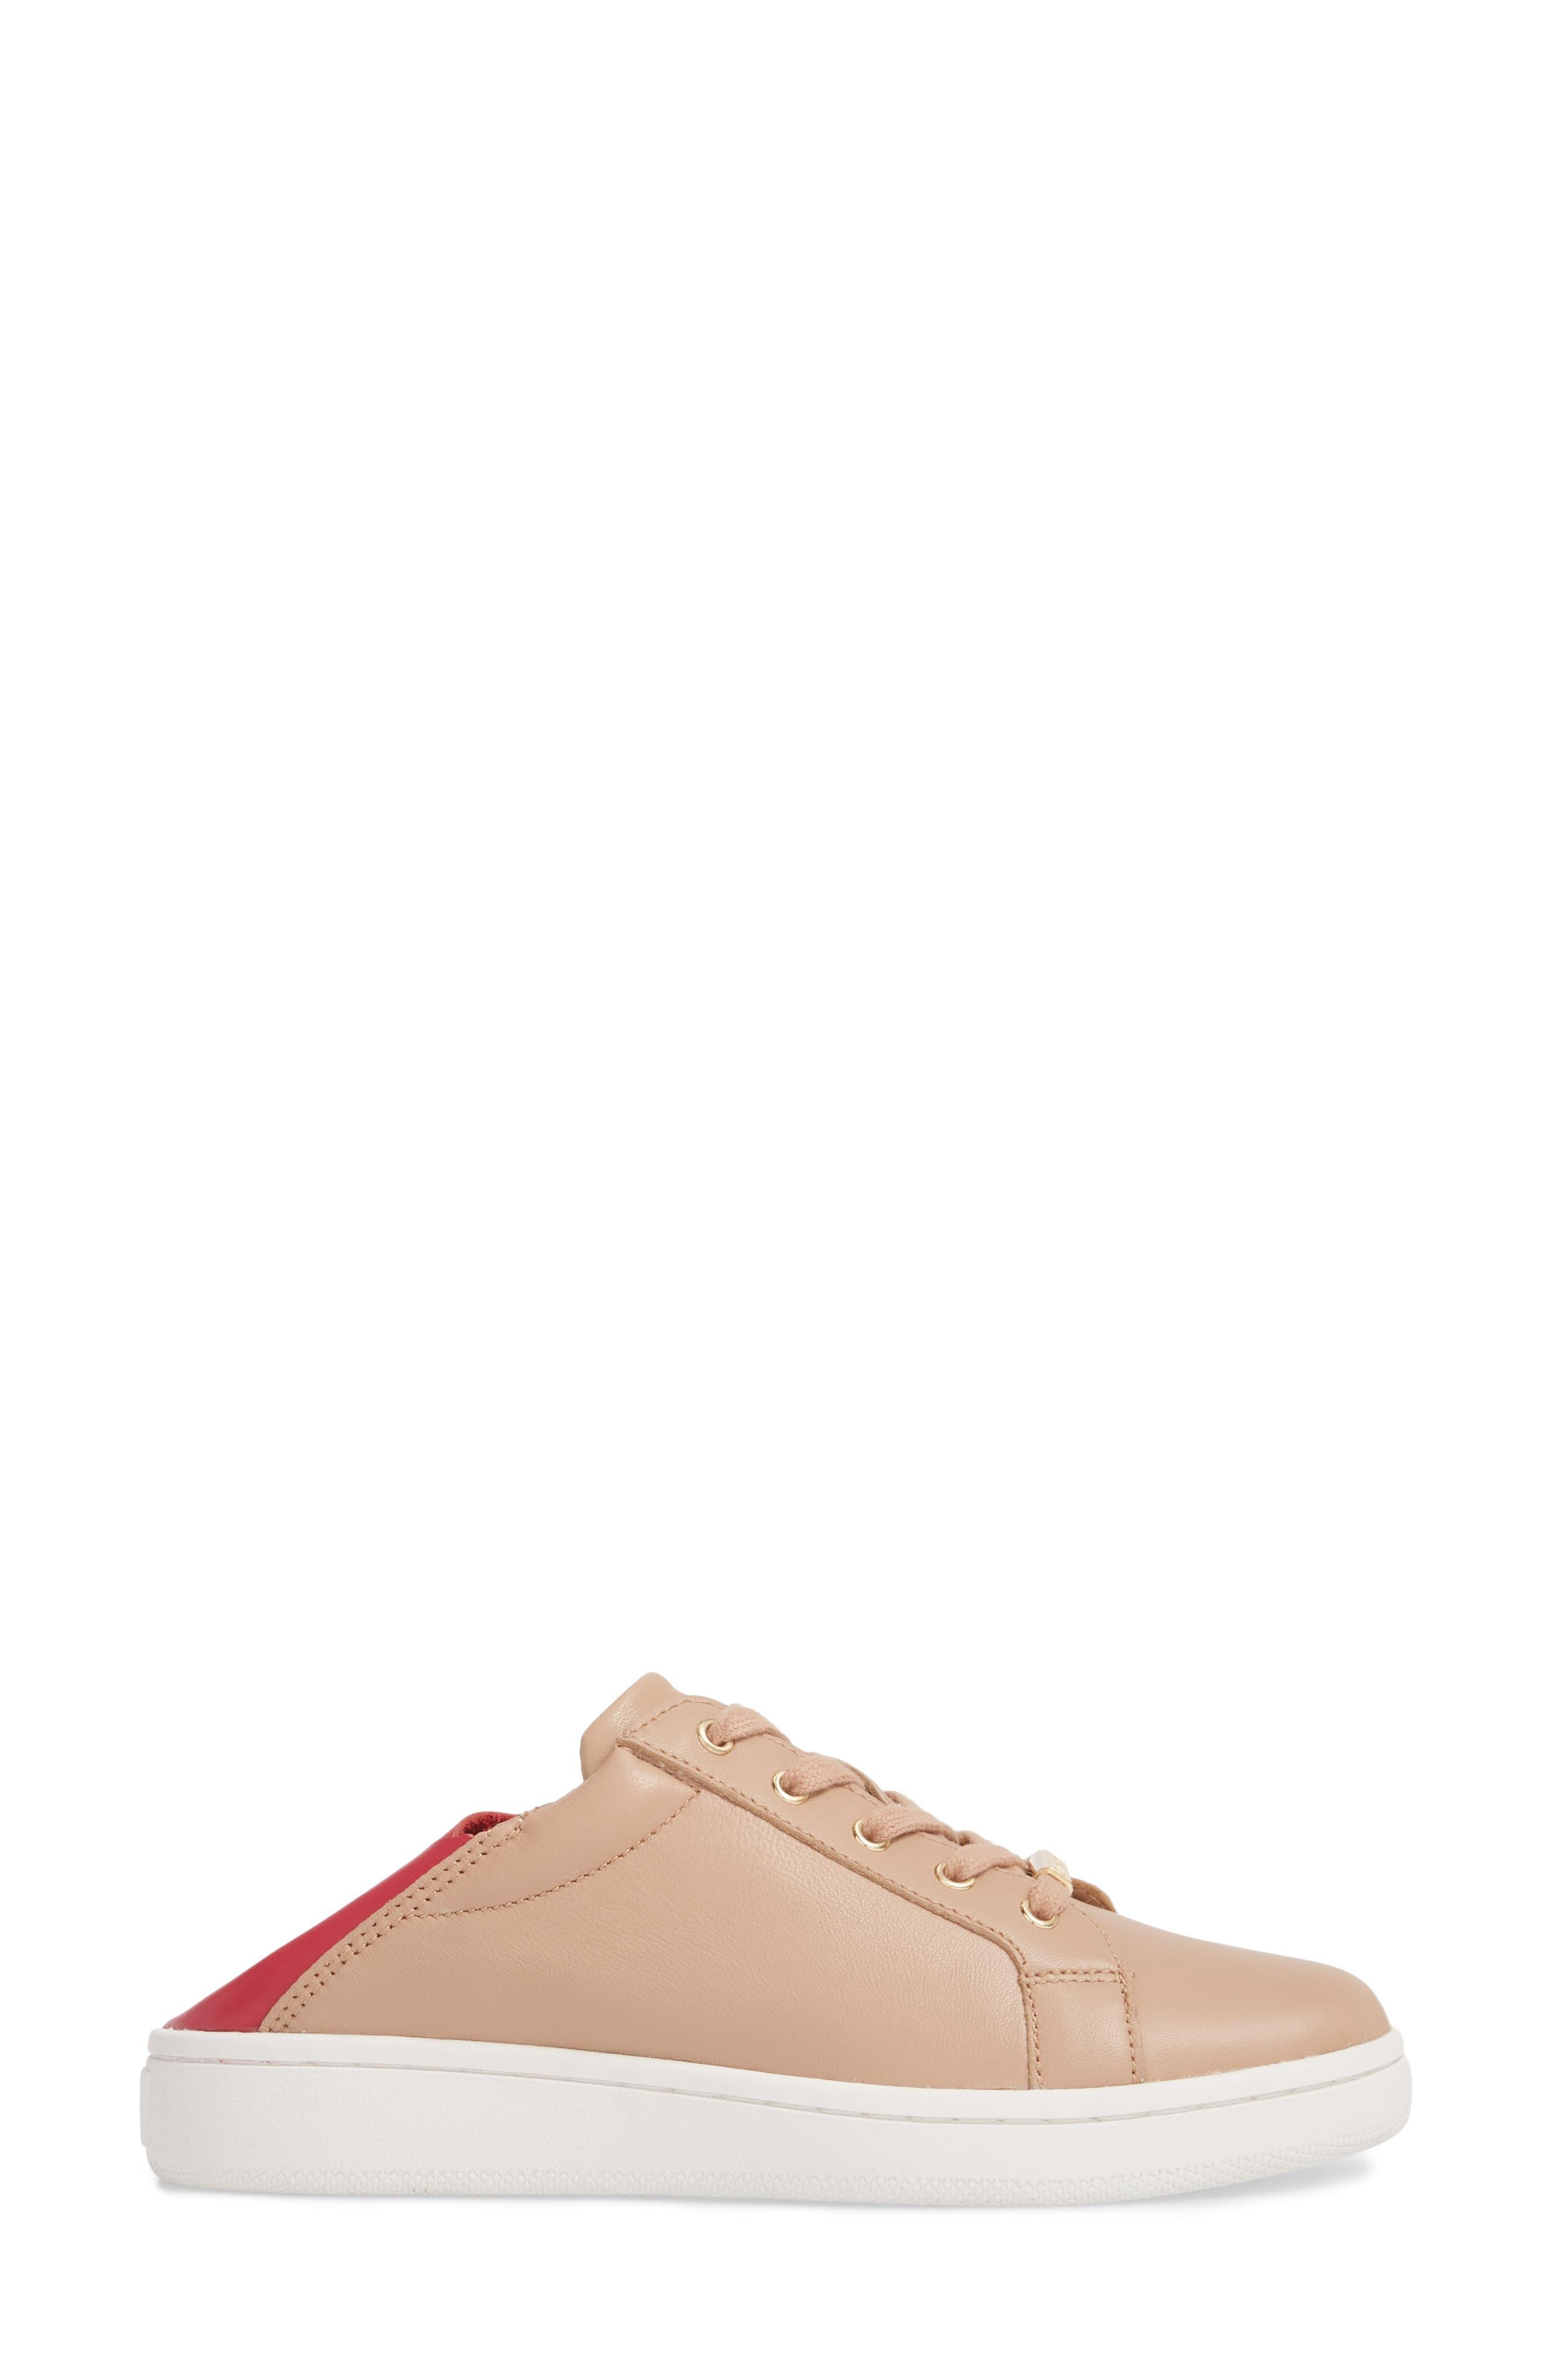 Danica Convertible Sneaker,                             Alternate thumbnail 4, color,                             Desert Sand Leather